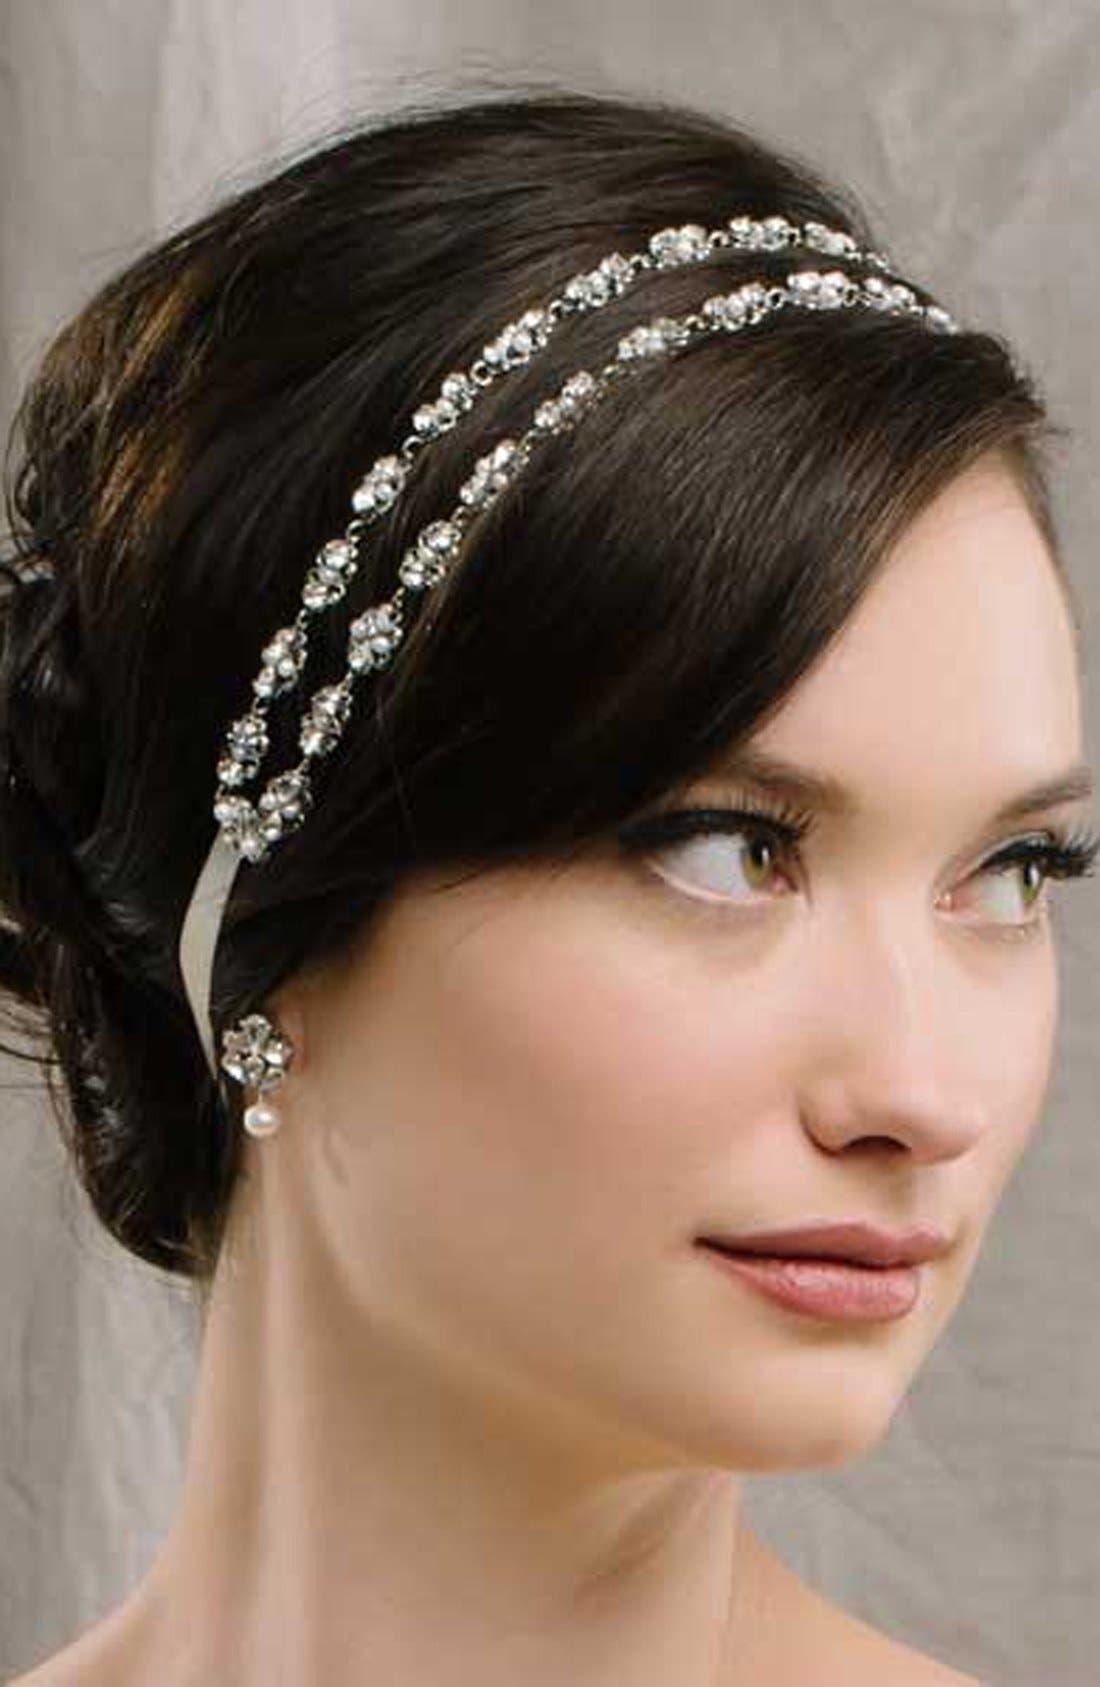 'Rose' Two Strand Filigree Hair Ribbon,                         Main,                         color, Pale Ivory